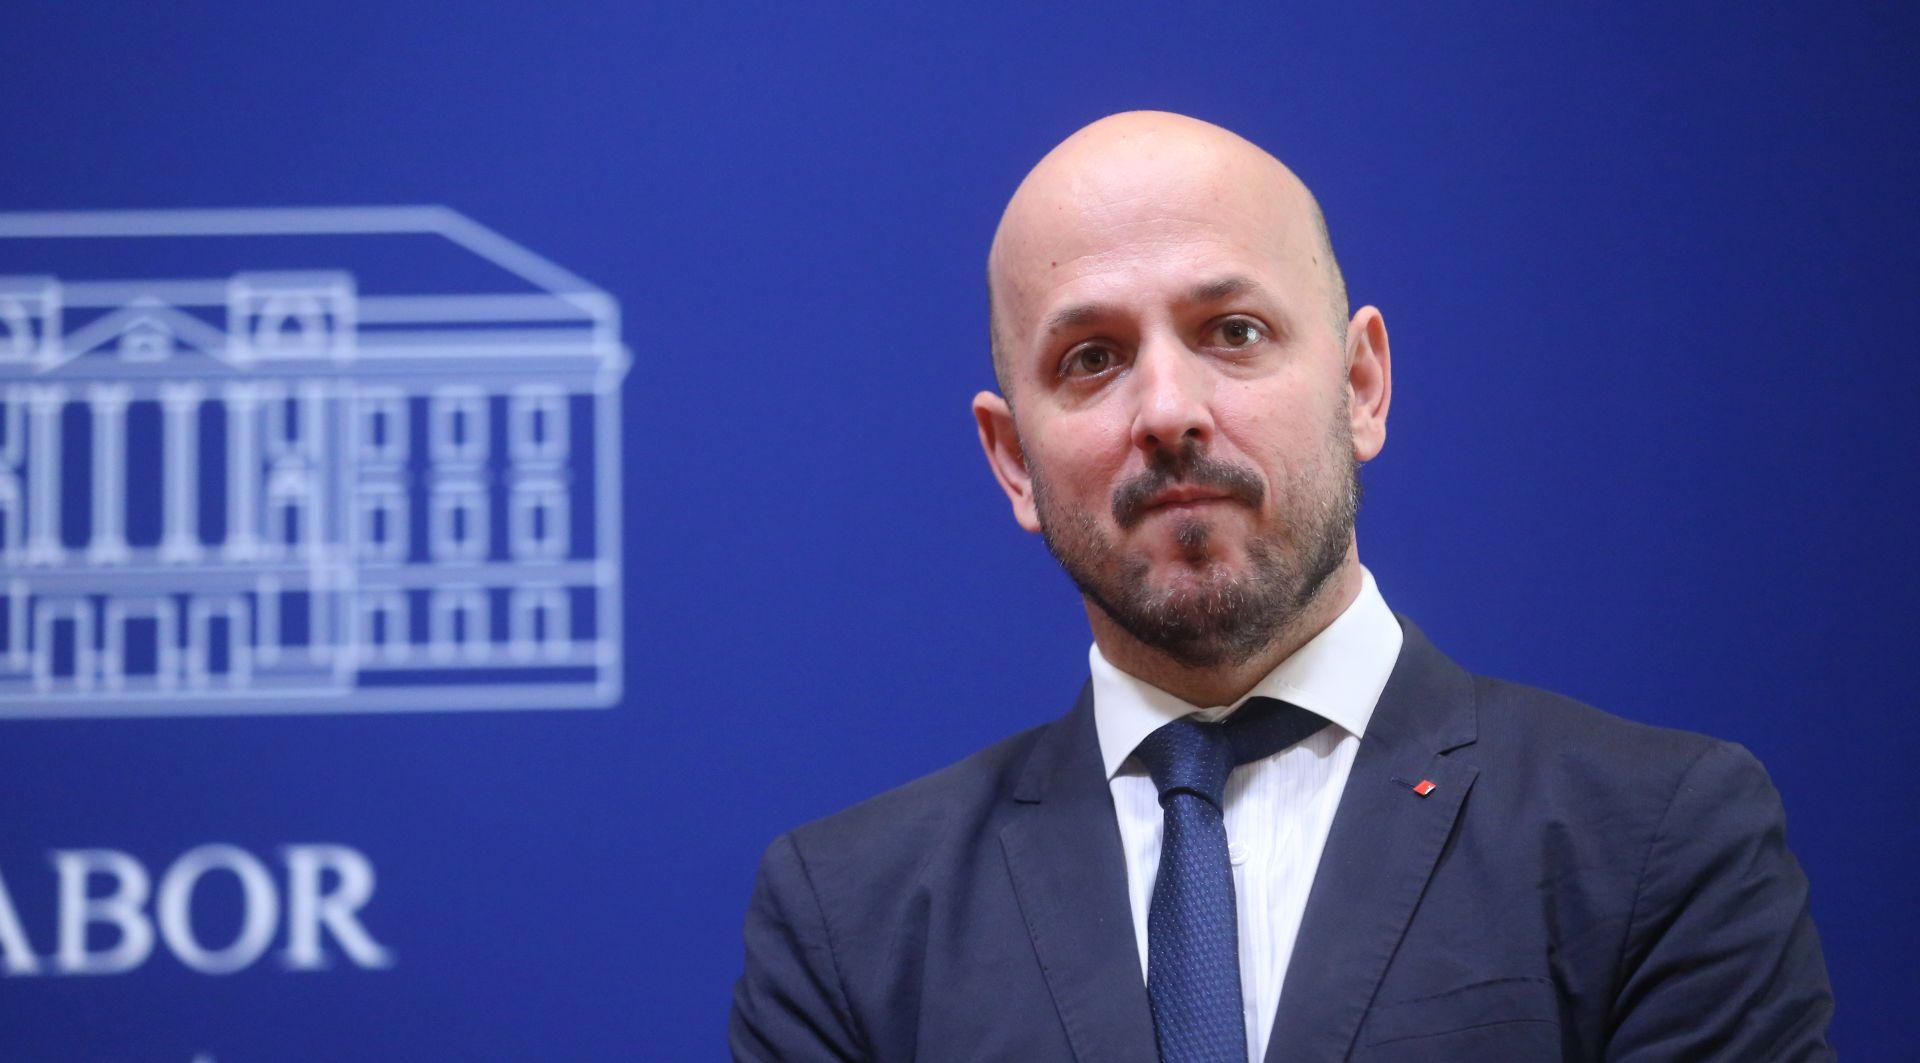 'NEDEMOKRATSKA LOGIKA' Maras podnosi ostavku u Klubu zastupnika SDP-a